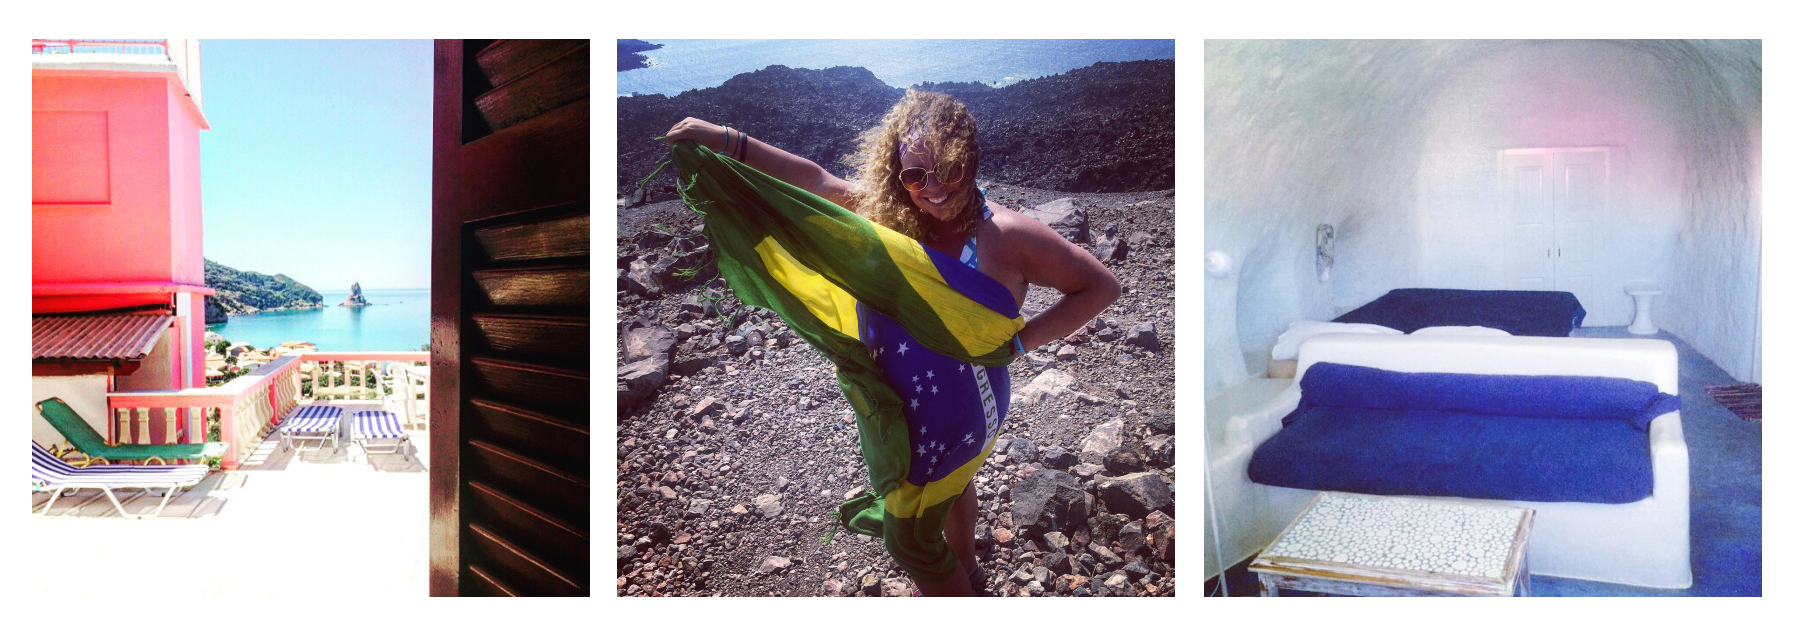 Jenna's stay at The Pink Palace in Corfu, Jenna atop a volcano in Santorini, Jenna's stay at Caveland in Santorini (photos by @jennalogic)